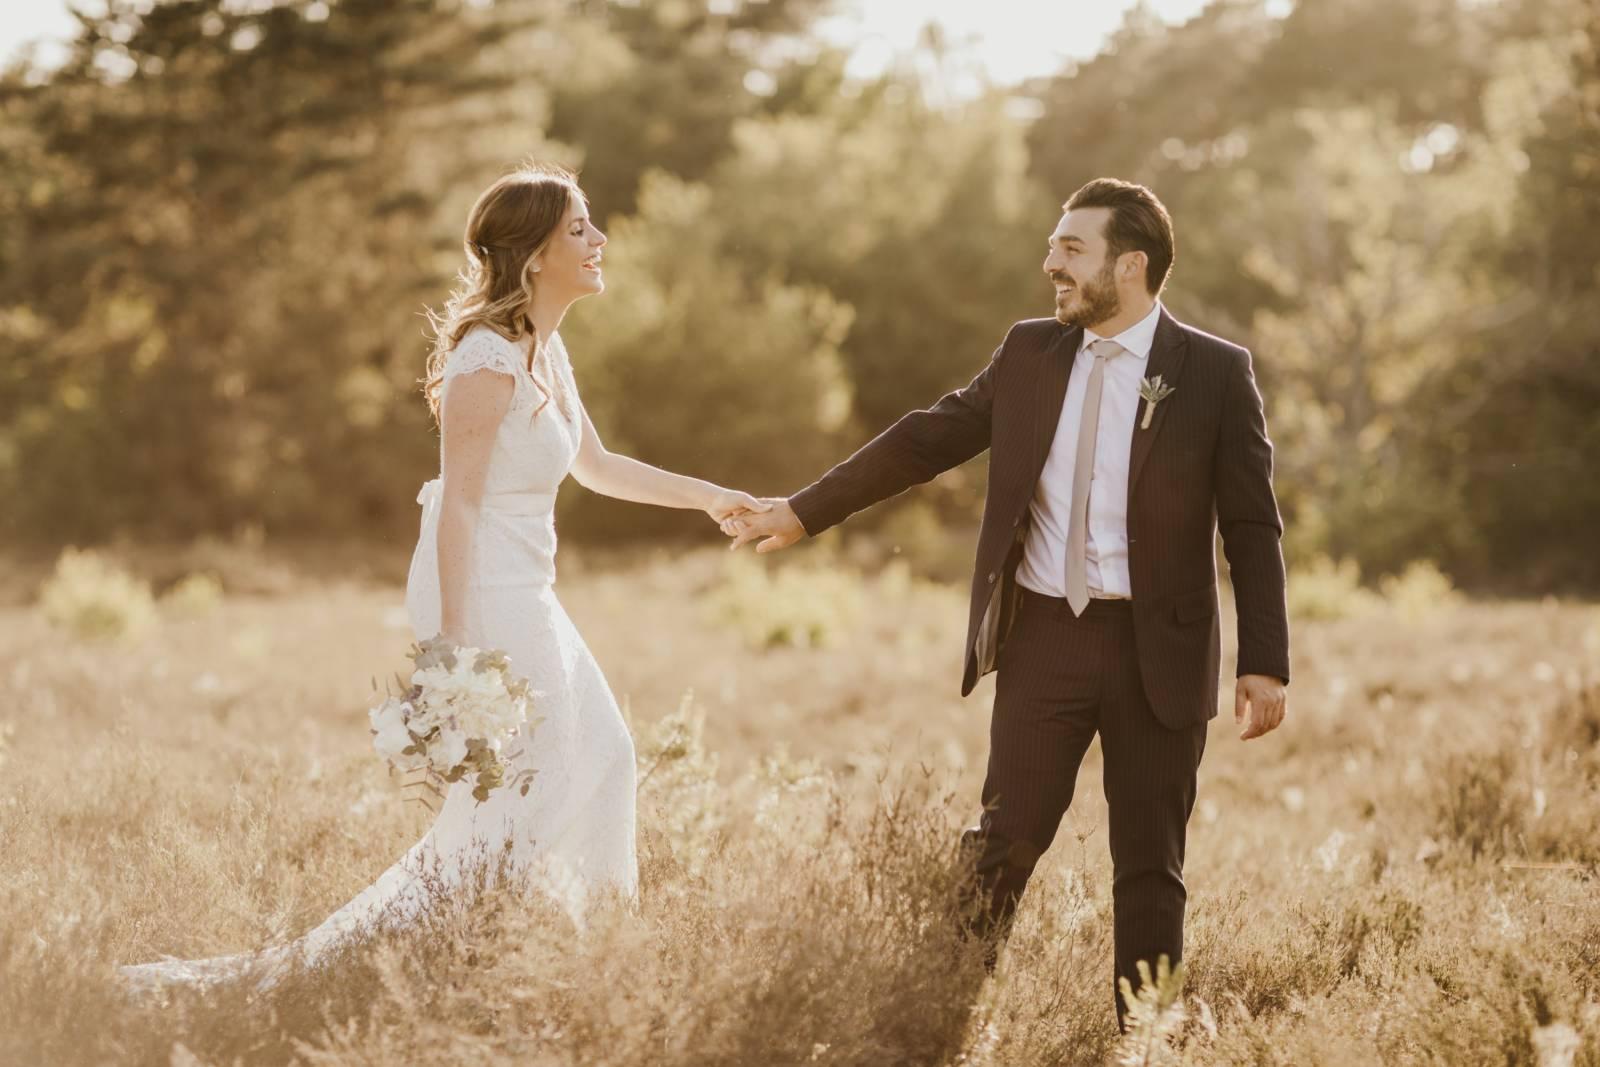 Imperish Photography - Fotograaf Silke - House of Weddings (16)